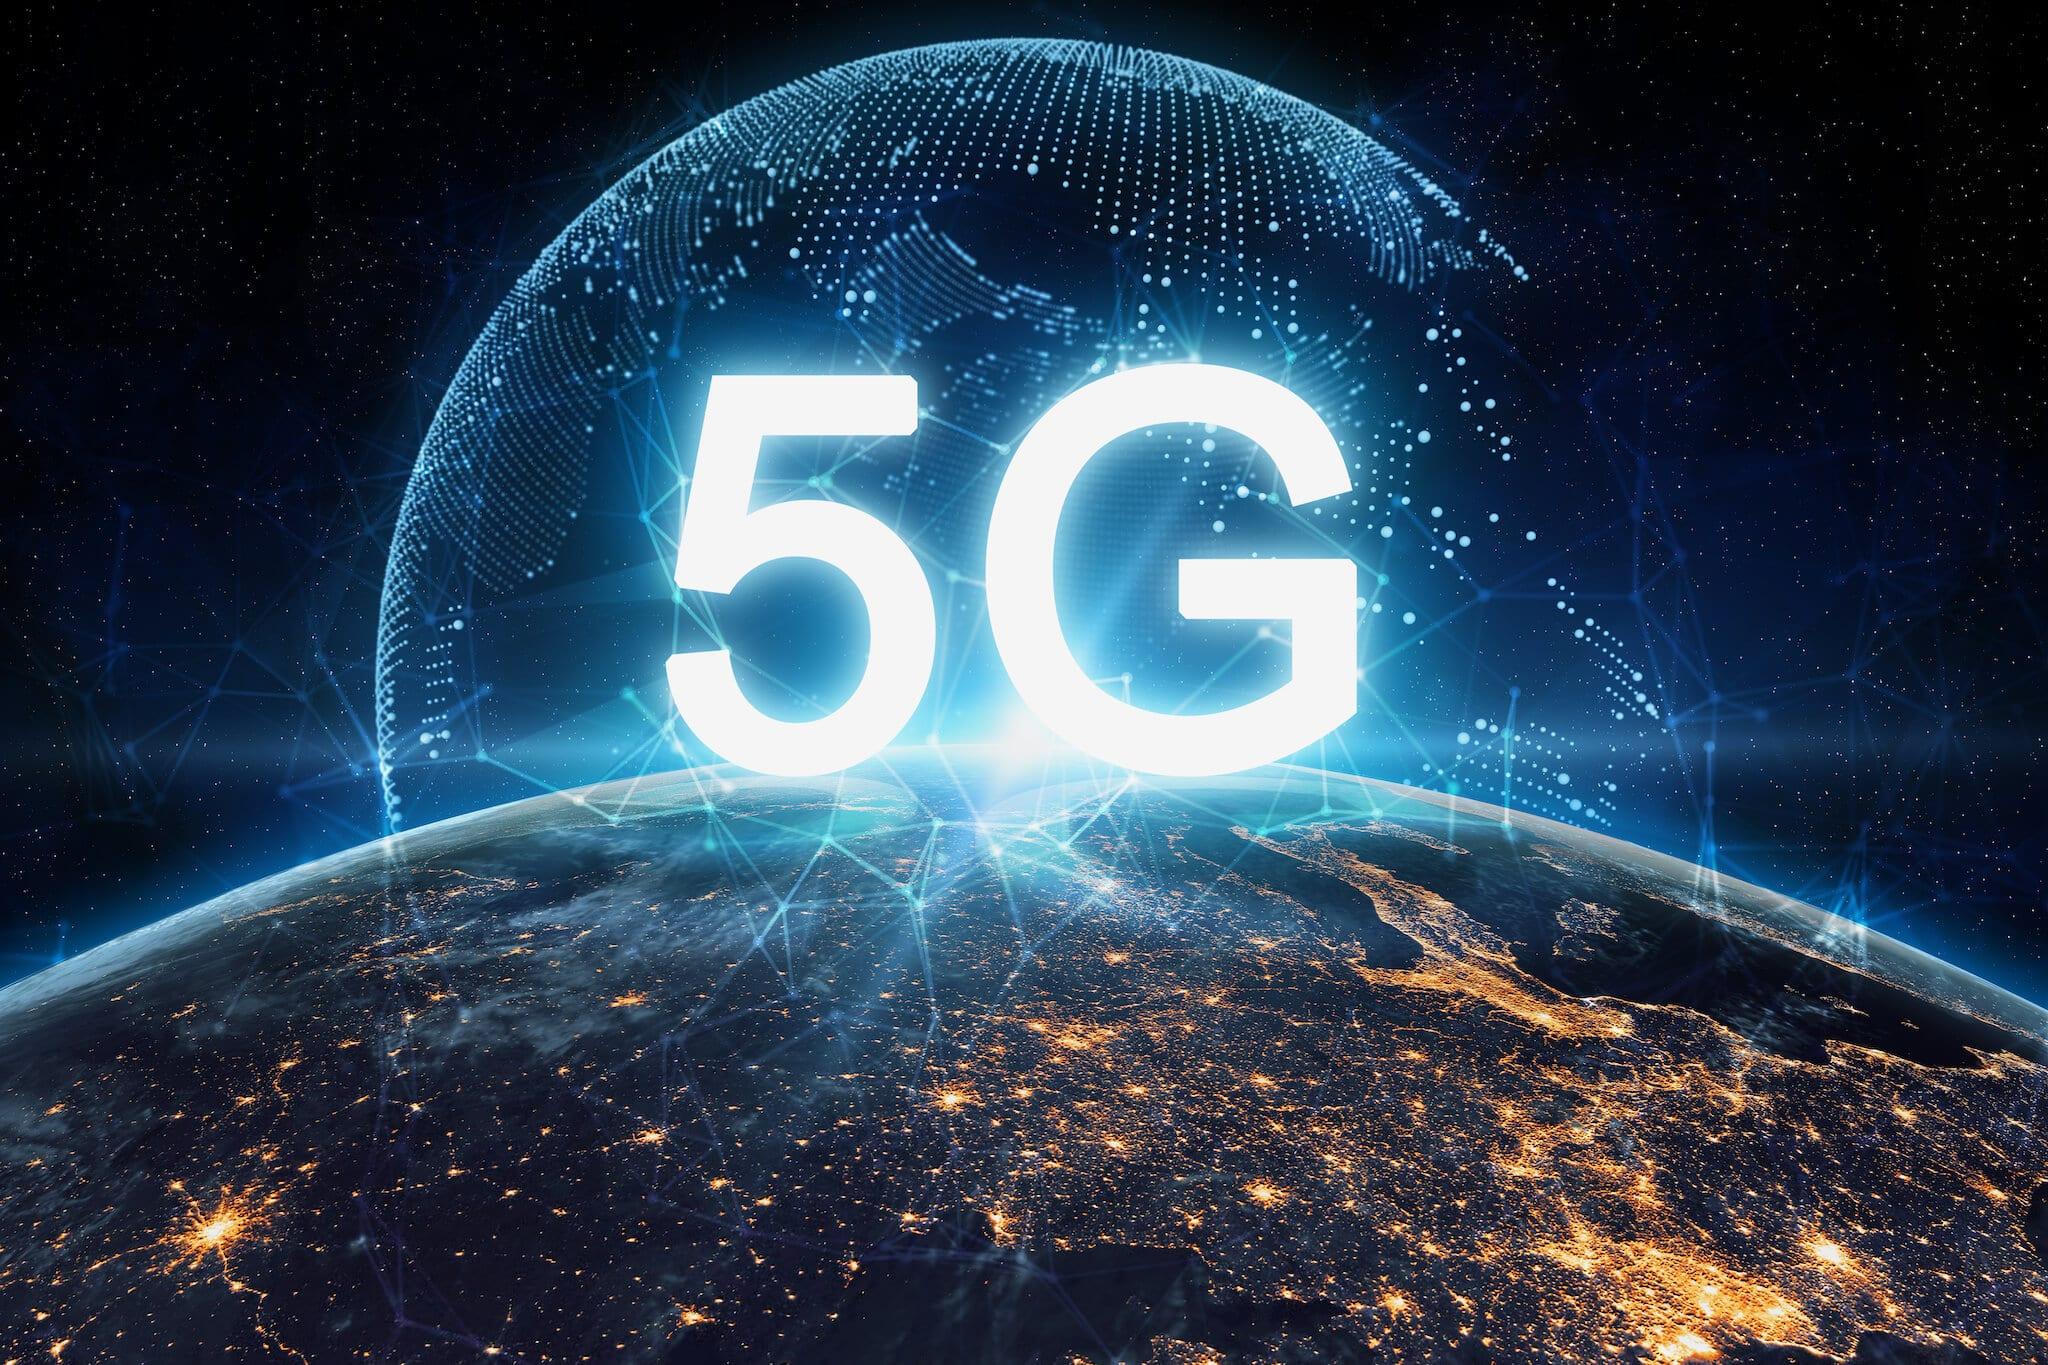 Will 5g Herald True Converged Communication